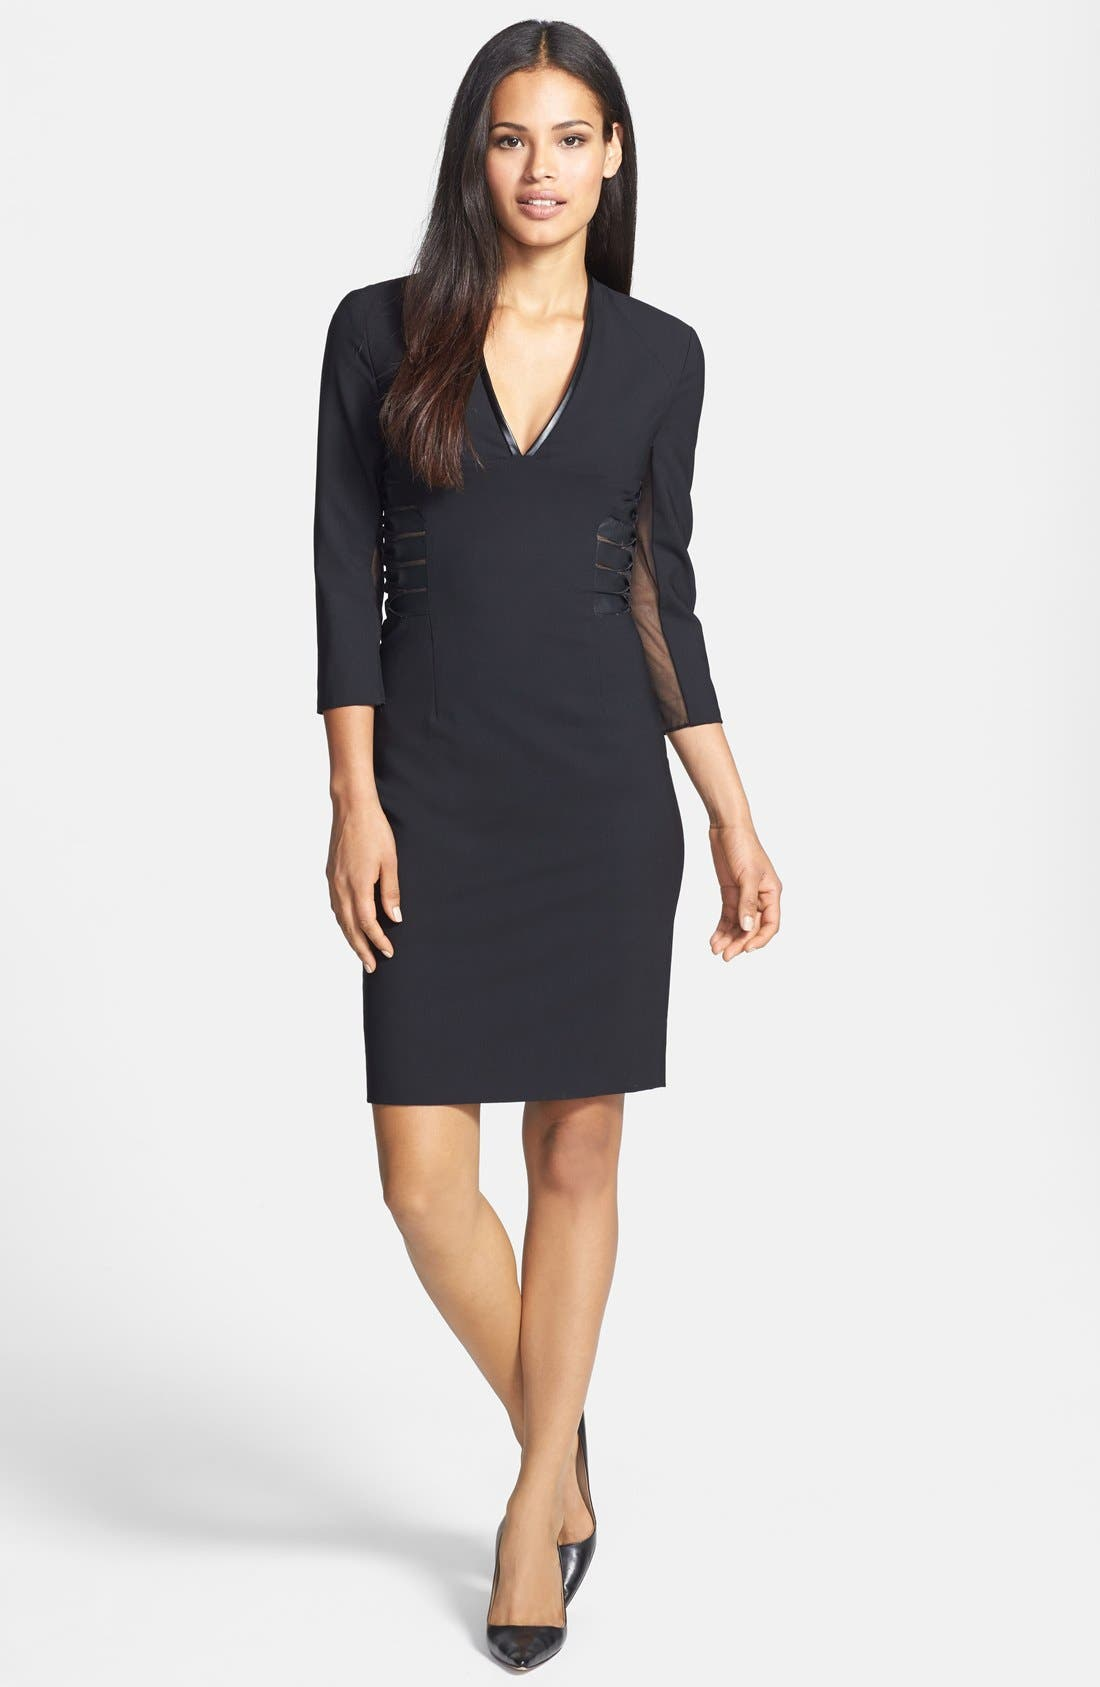 Alternate Image 1 Selected - Rachel Roy Faux Leather Trim V-Neck Dress